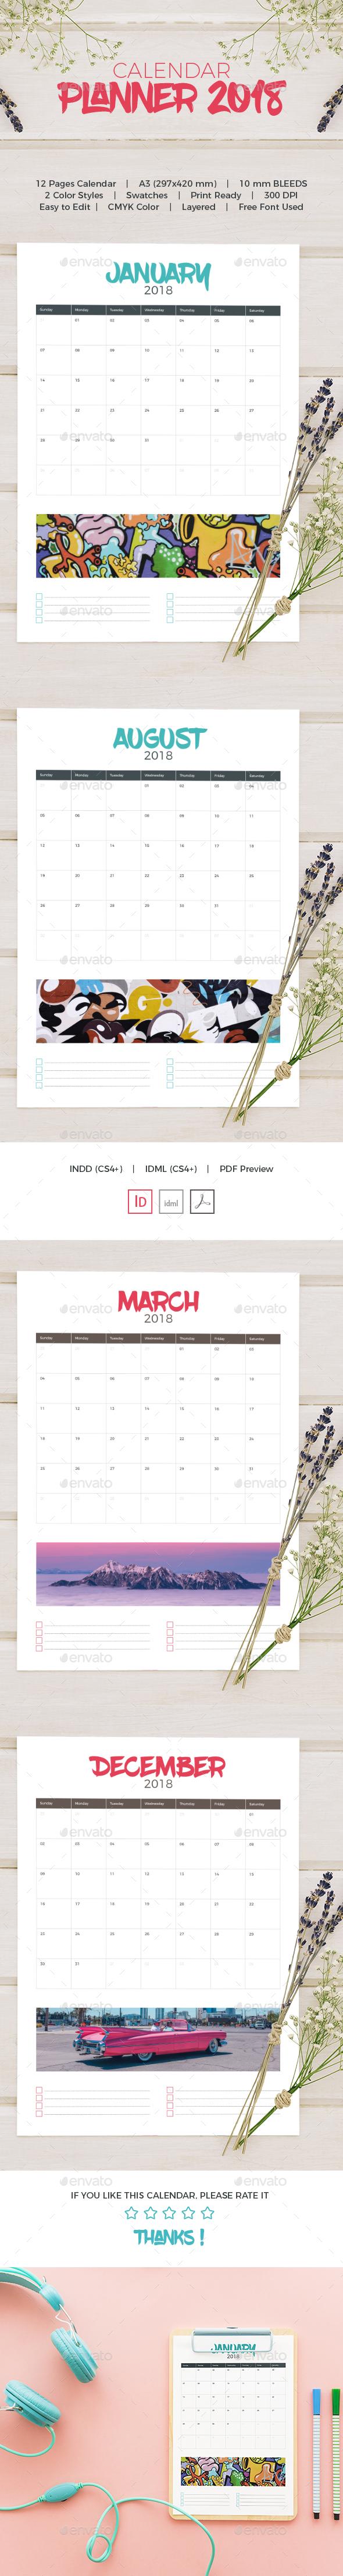 Calendar Planner 2018 - Calendars Stationery